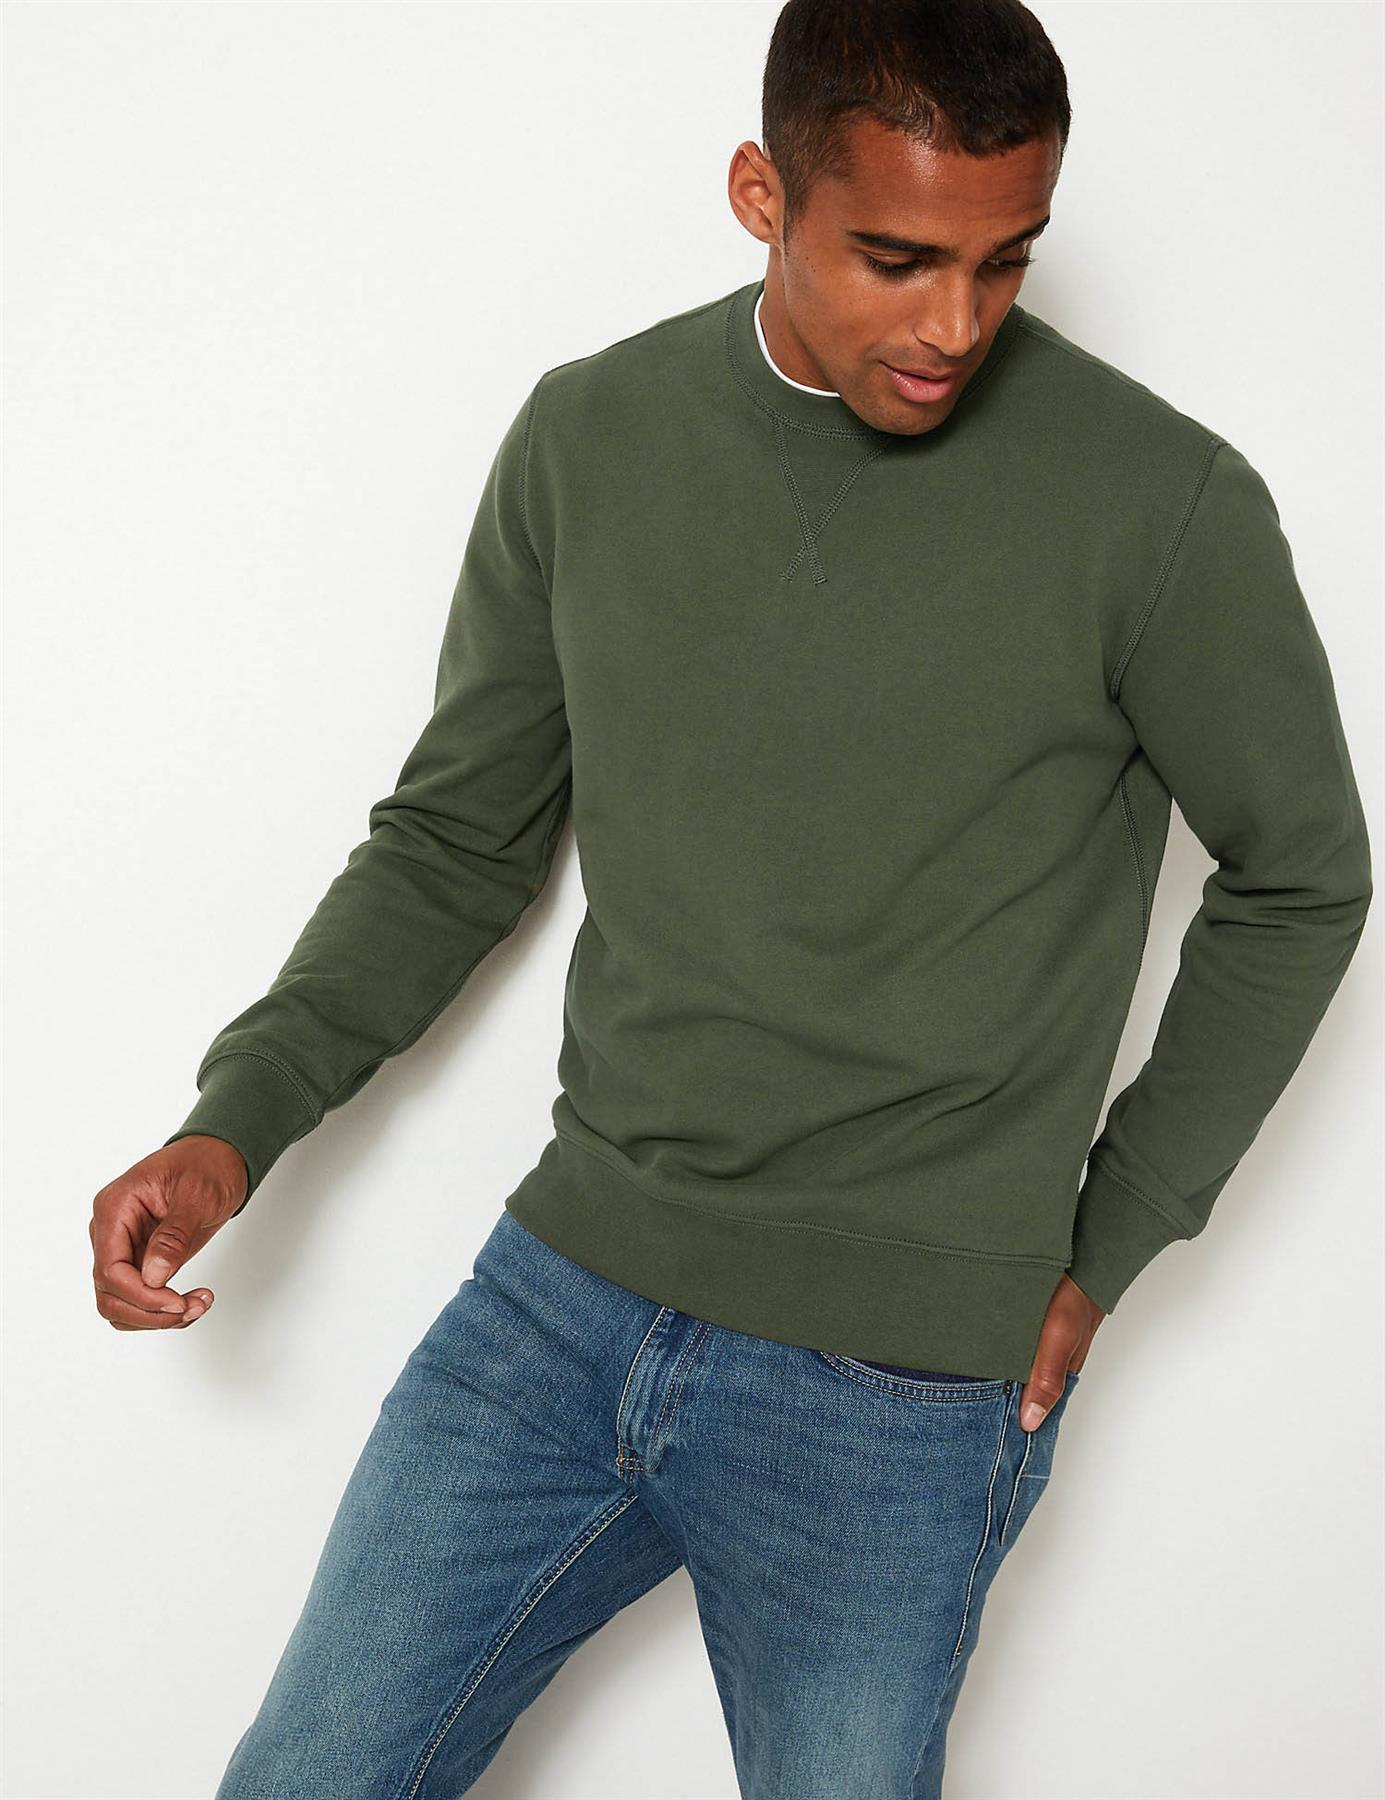 Ex-M-amp-S-Mens-Cotton-Crew-Neck-Sweatshirt-Marks-amp-Spencer-Size-S-3XL thumbnail 19